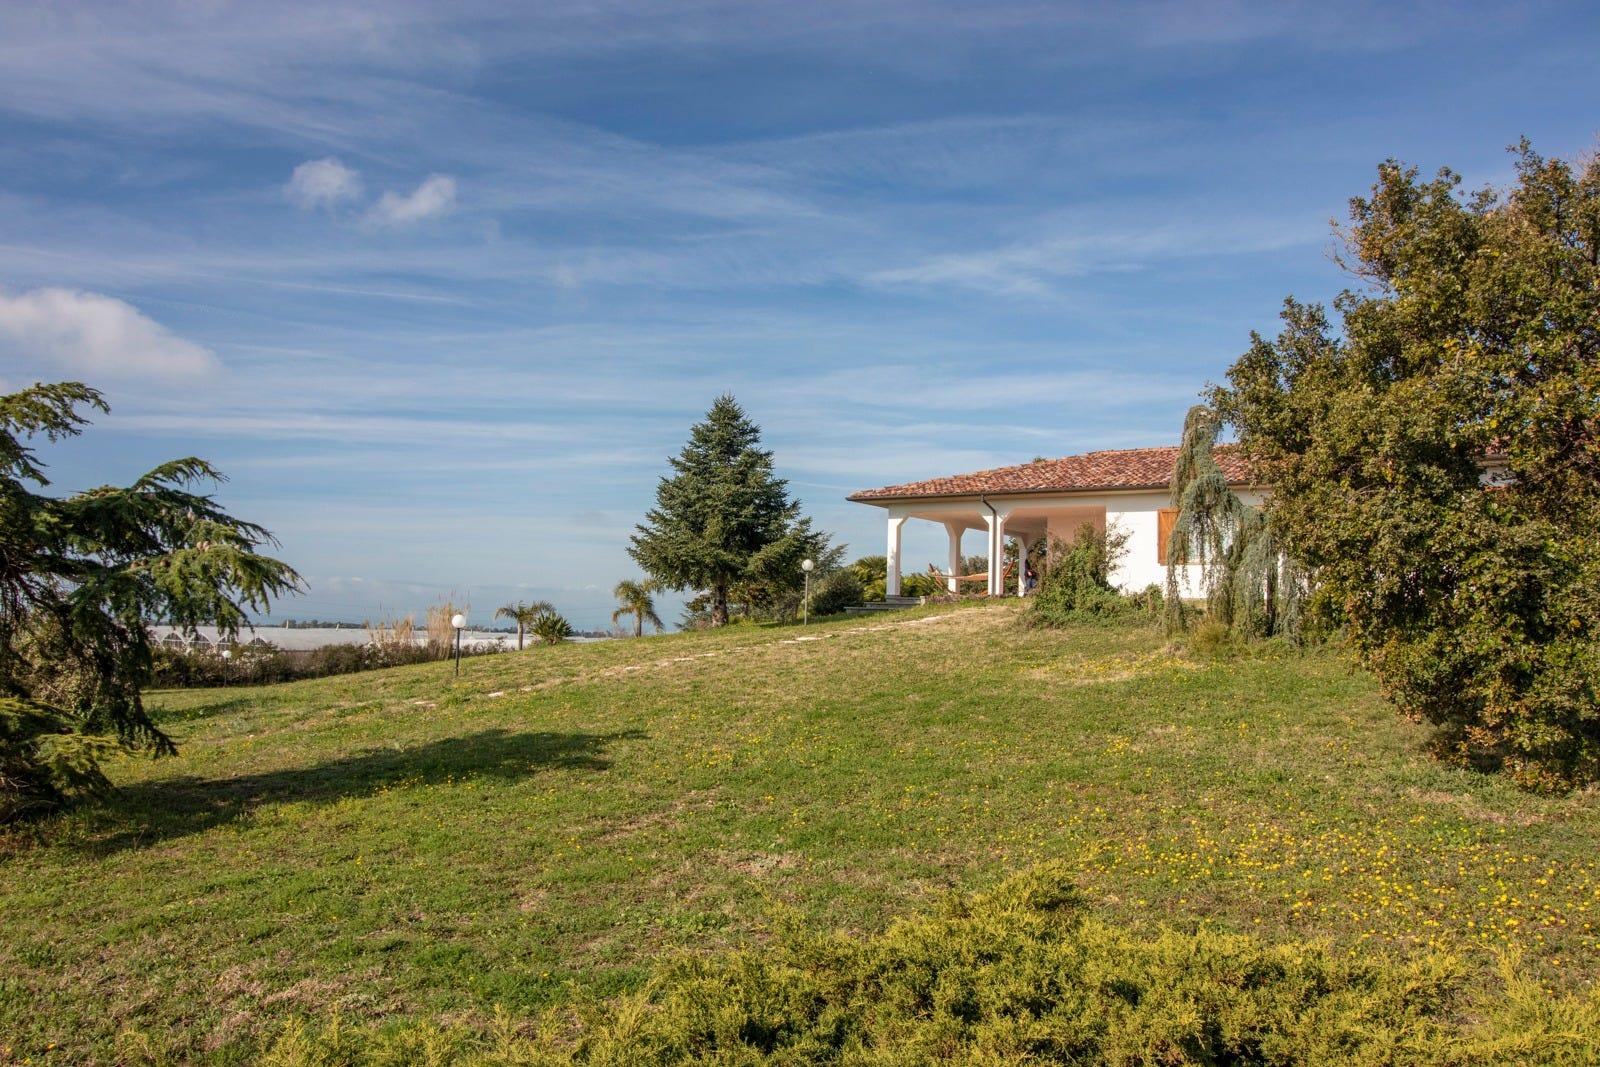 Villa_Tarquinia (2)